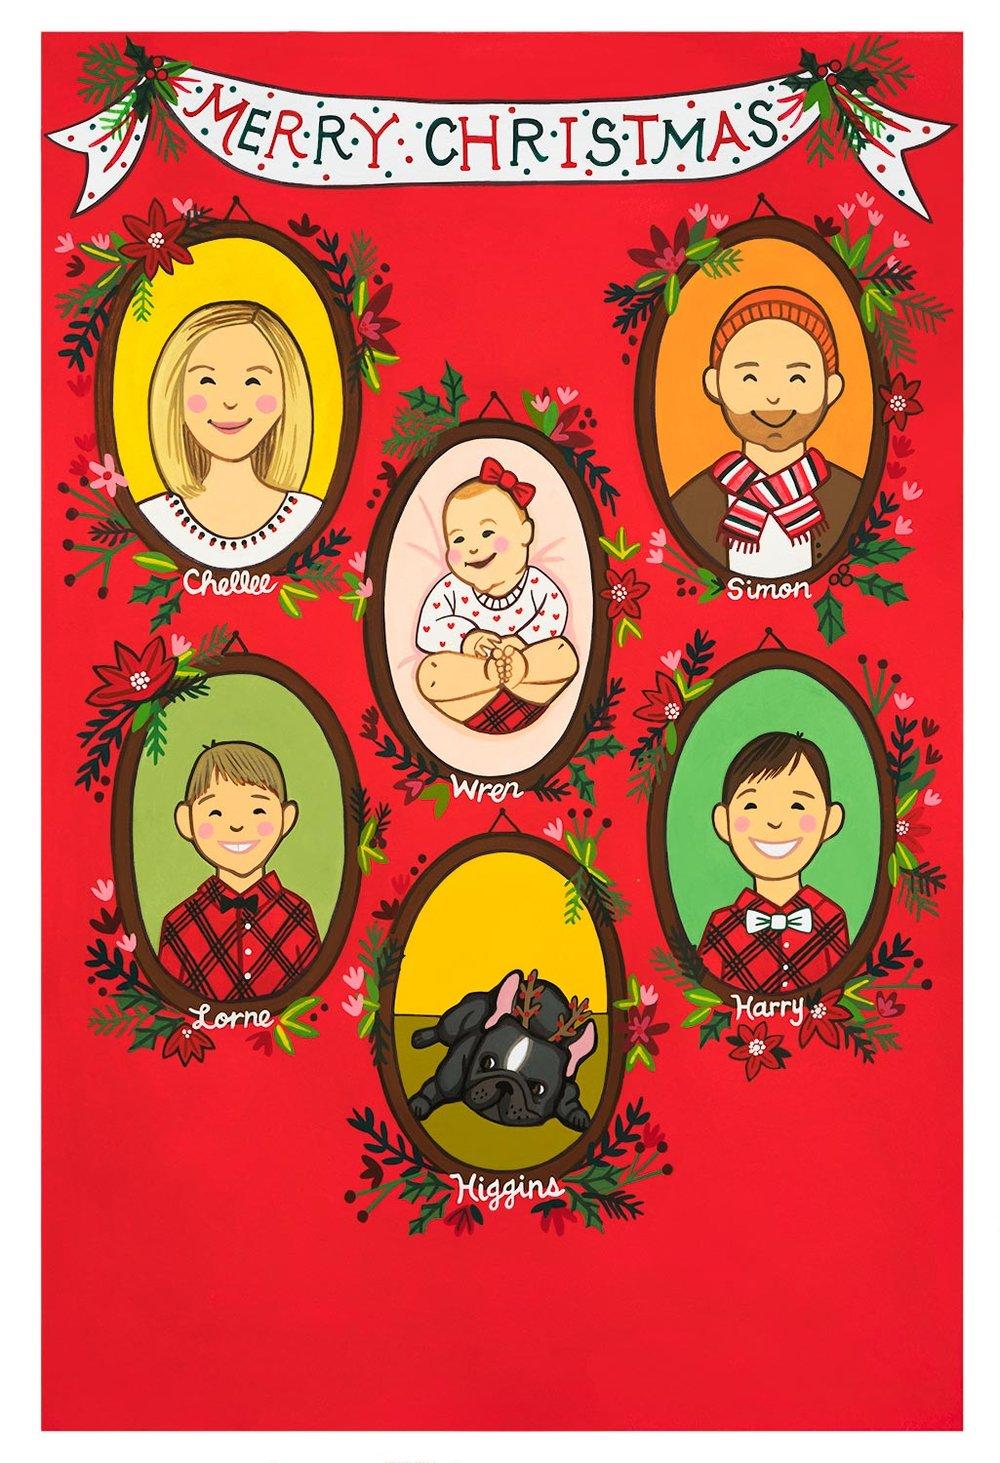 cassels family christmas card.jpg